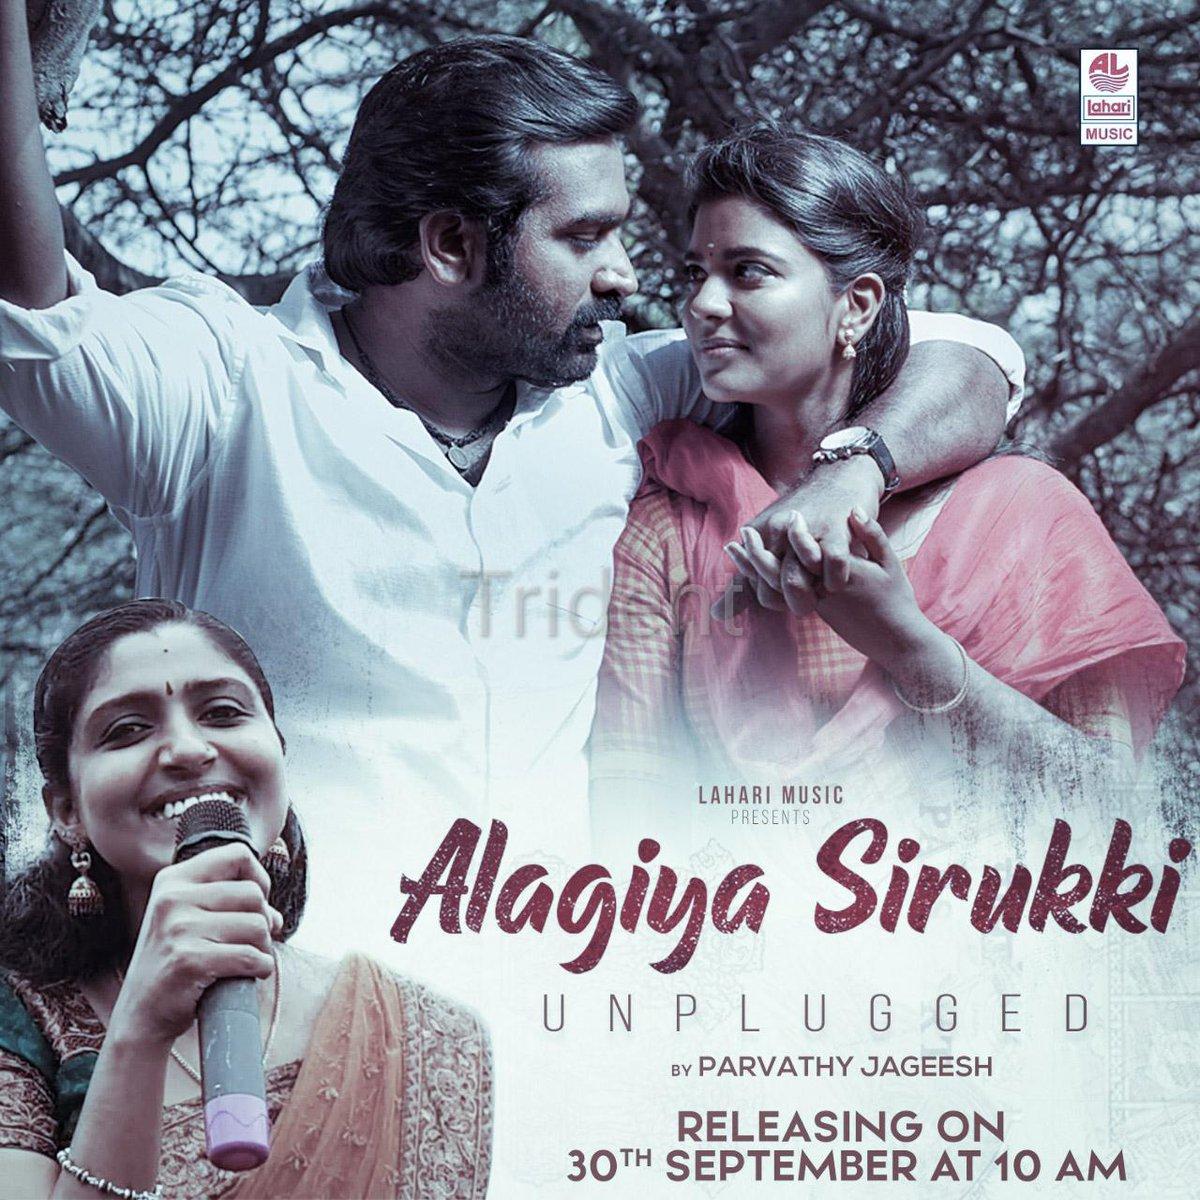 #LahariMusic presents #AlagiyaSirukki unplugged by #ParvathyJageesh releasing on September 30th at 10 AM... #VijaySethupathi #AishwaryaRajesh @aishu_dil